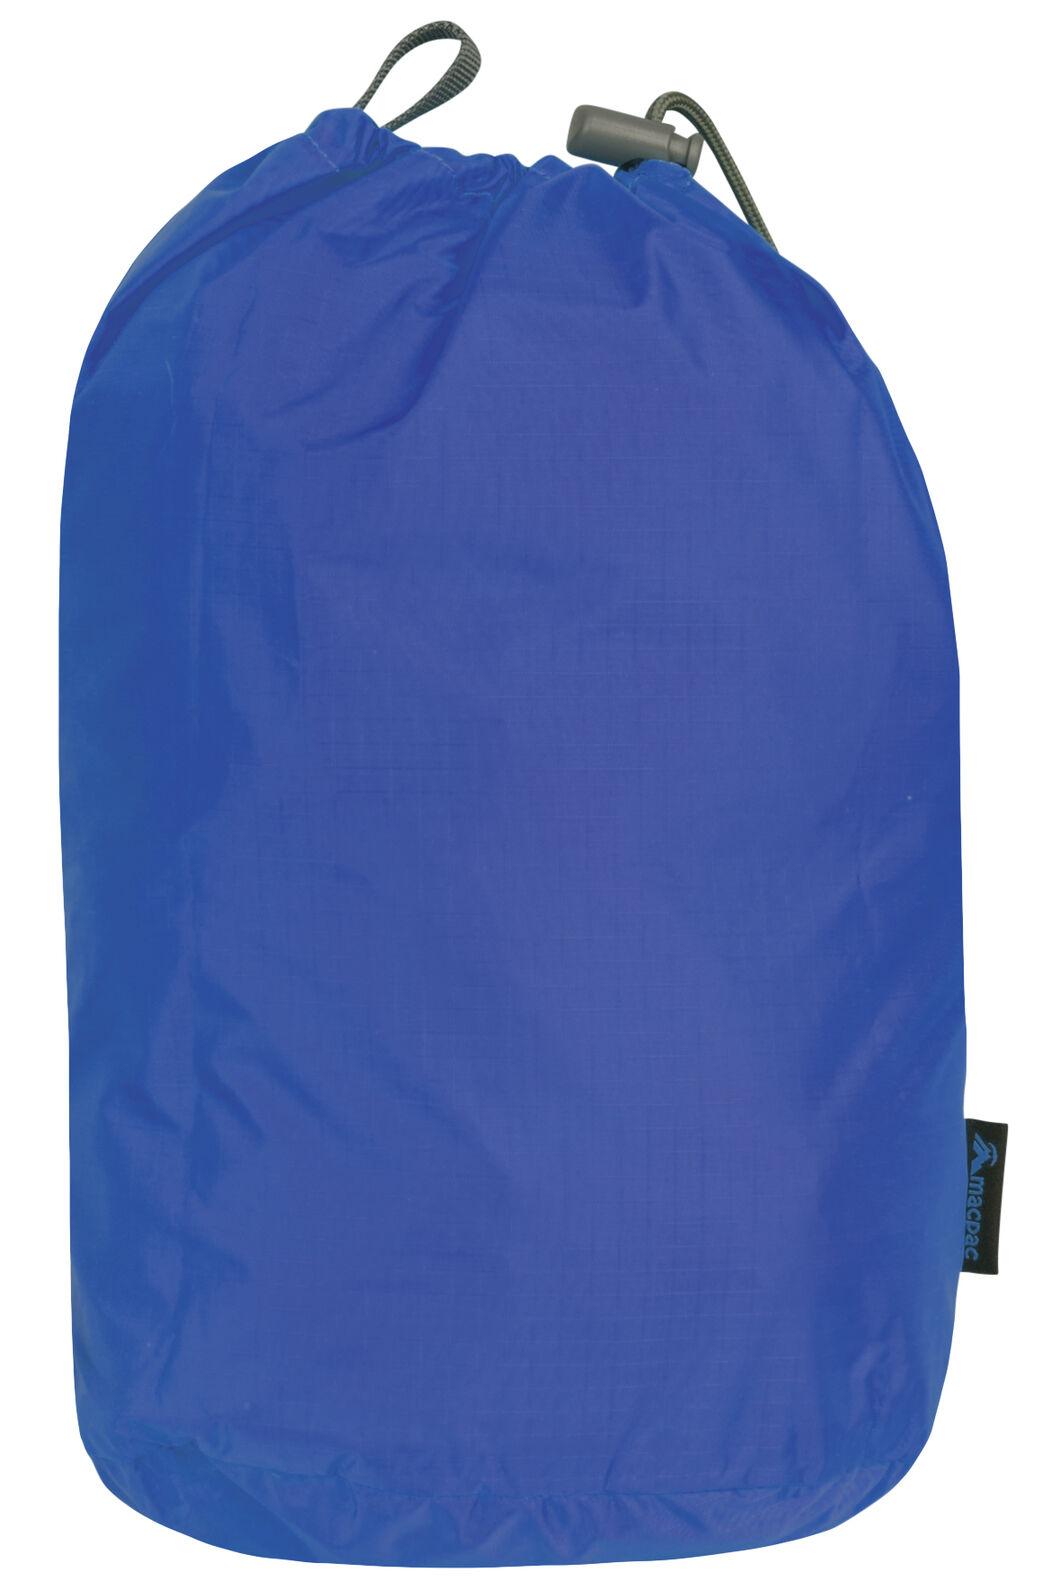 Macpac Medium Stuff Sack, Sodalite Blue, hi-res